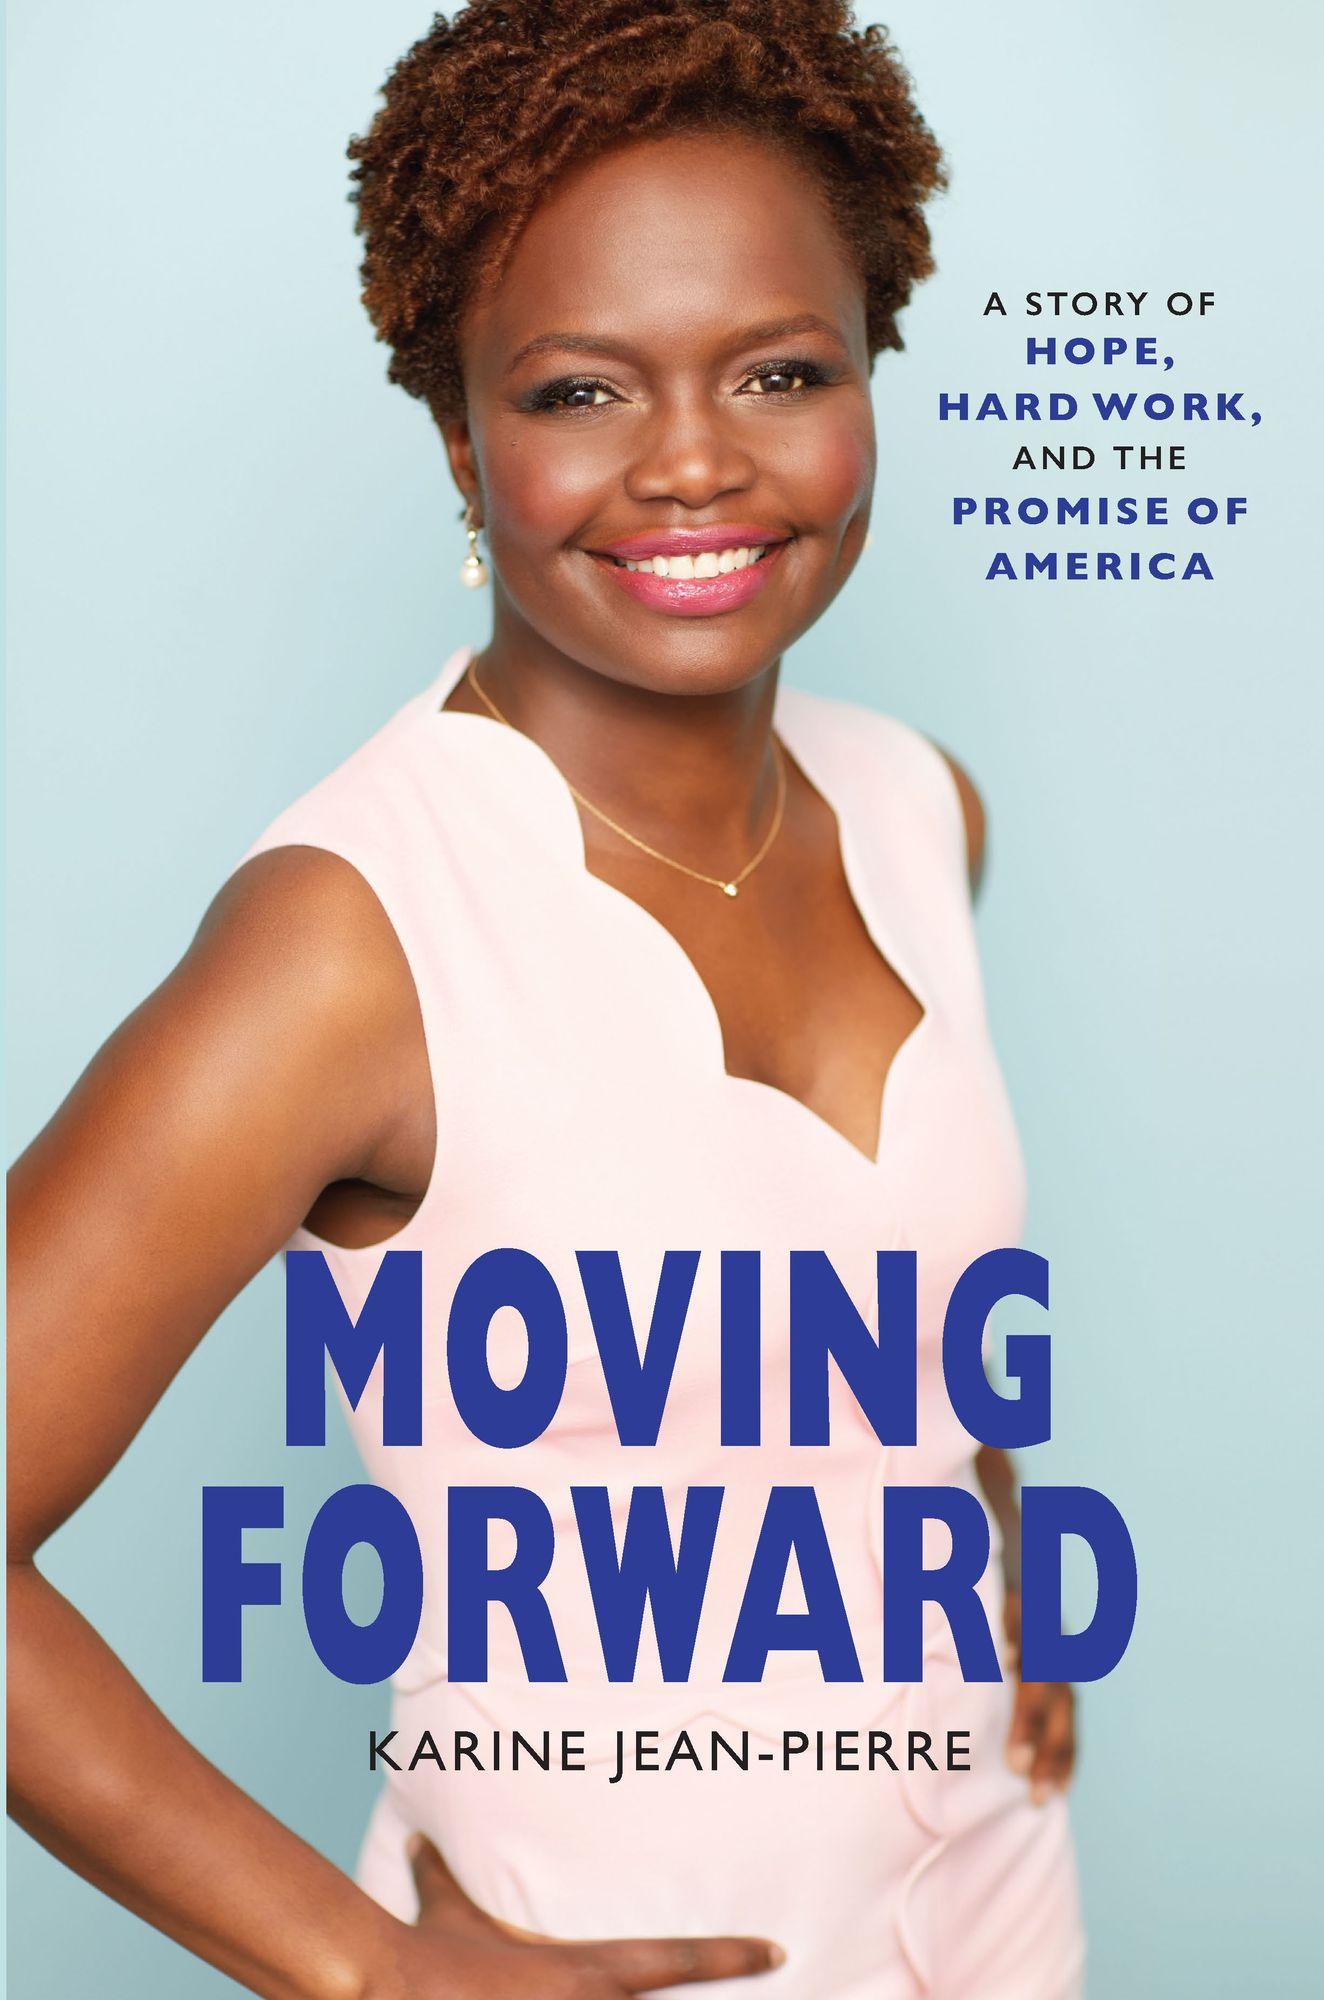 Moving Forward by Karine Jean-Pierre